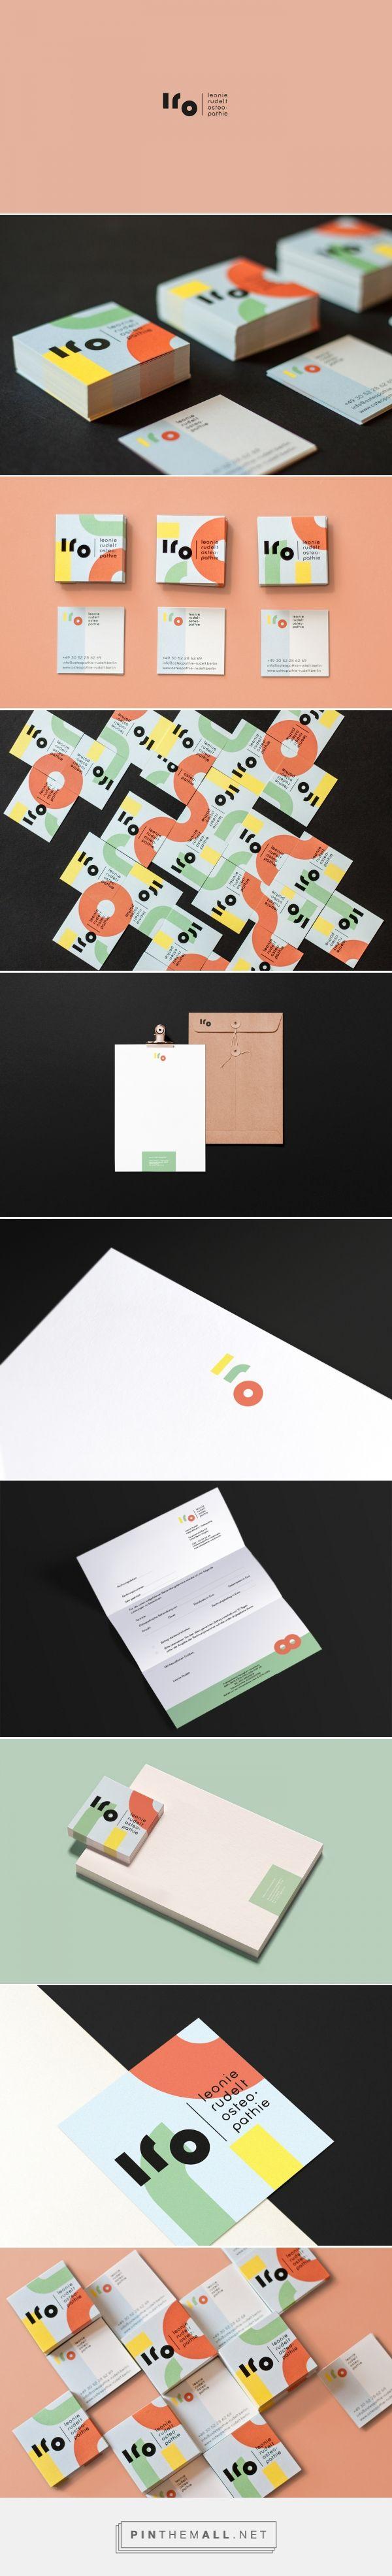 Leonie Rudelt Osteopathie Branding by Alessia Sistori - 간단한 패턴이지만 색 조합이 귀엽다